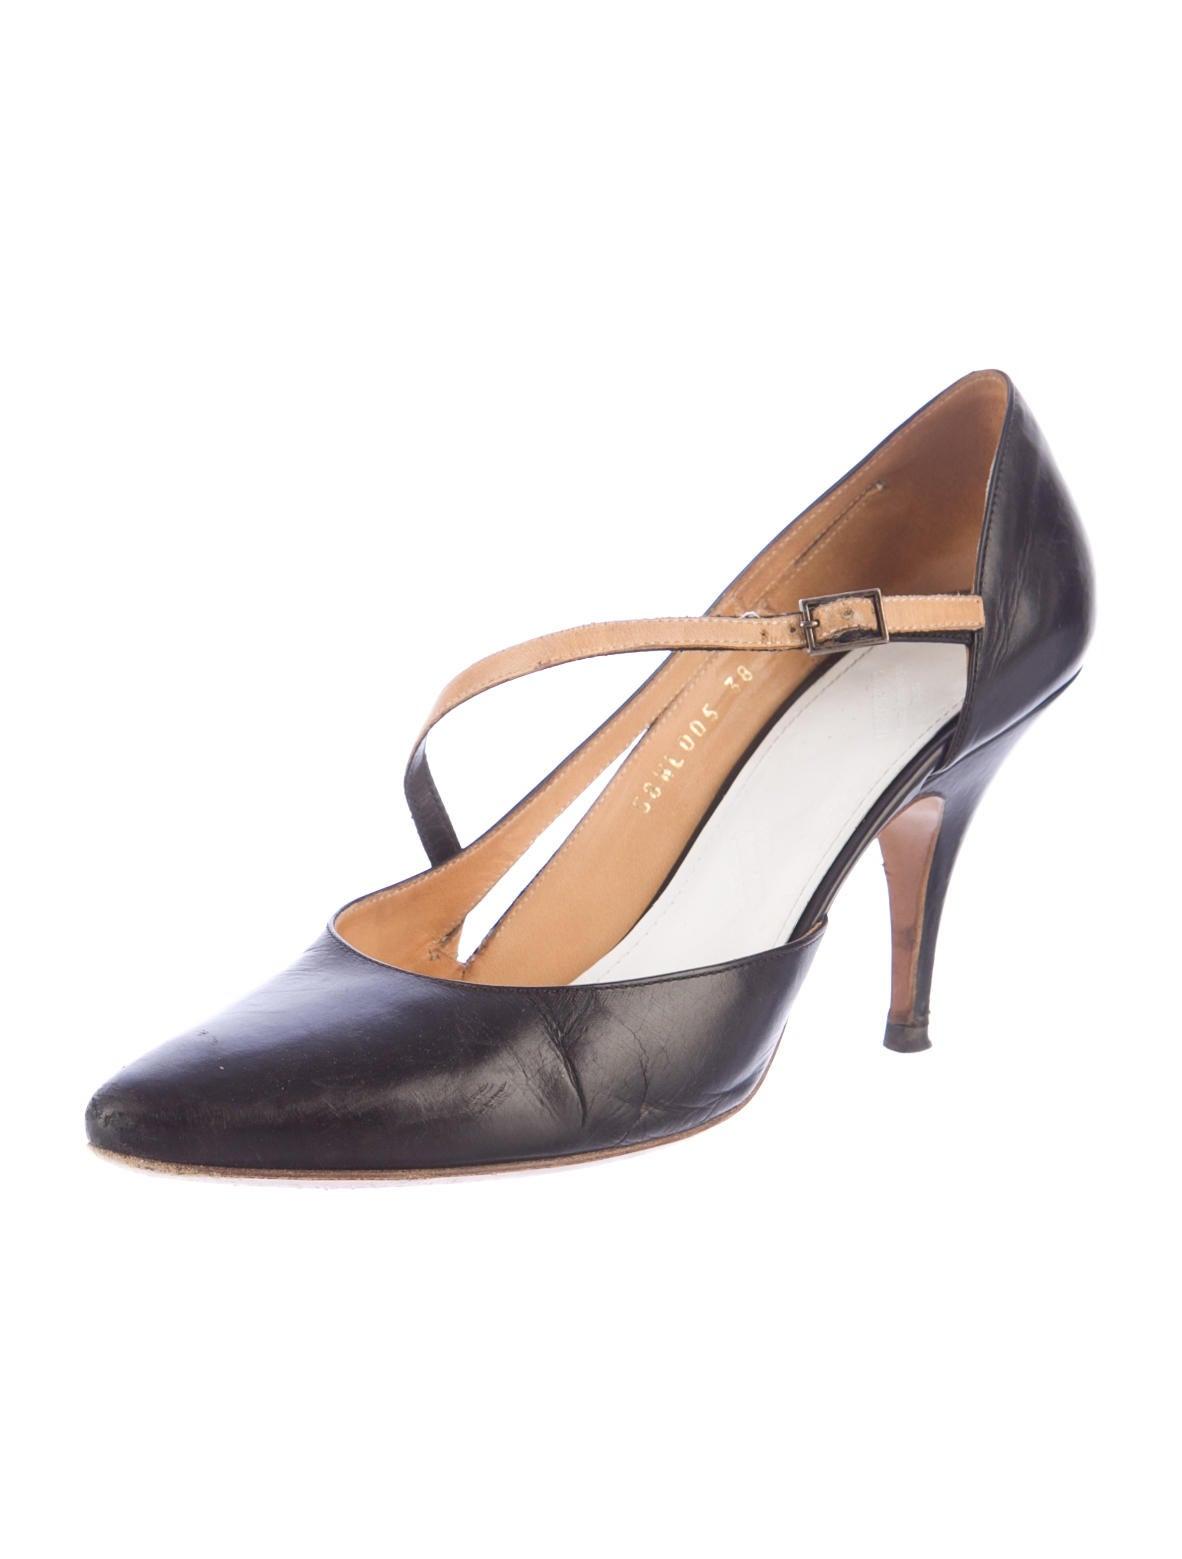 maison martin margiela pumps shoes mai24174 the realreal. Black Bedroom Furniture Sets. Home Design Ideas